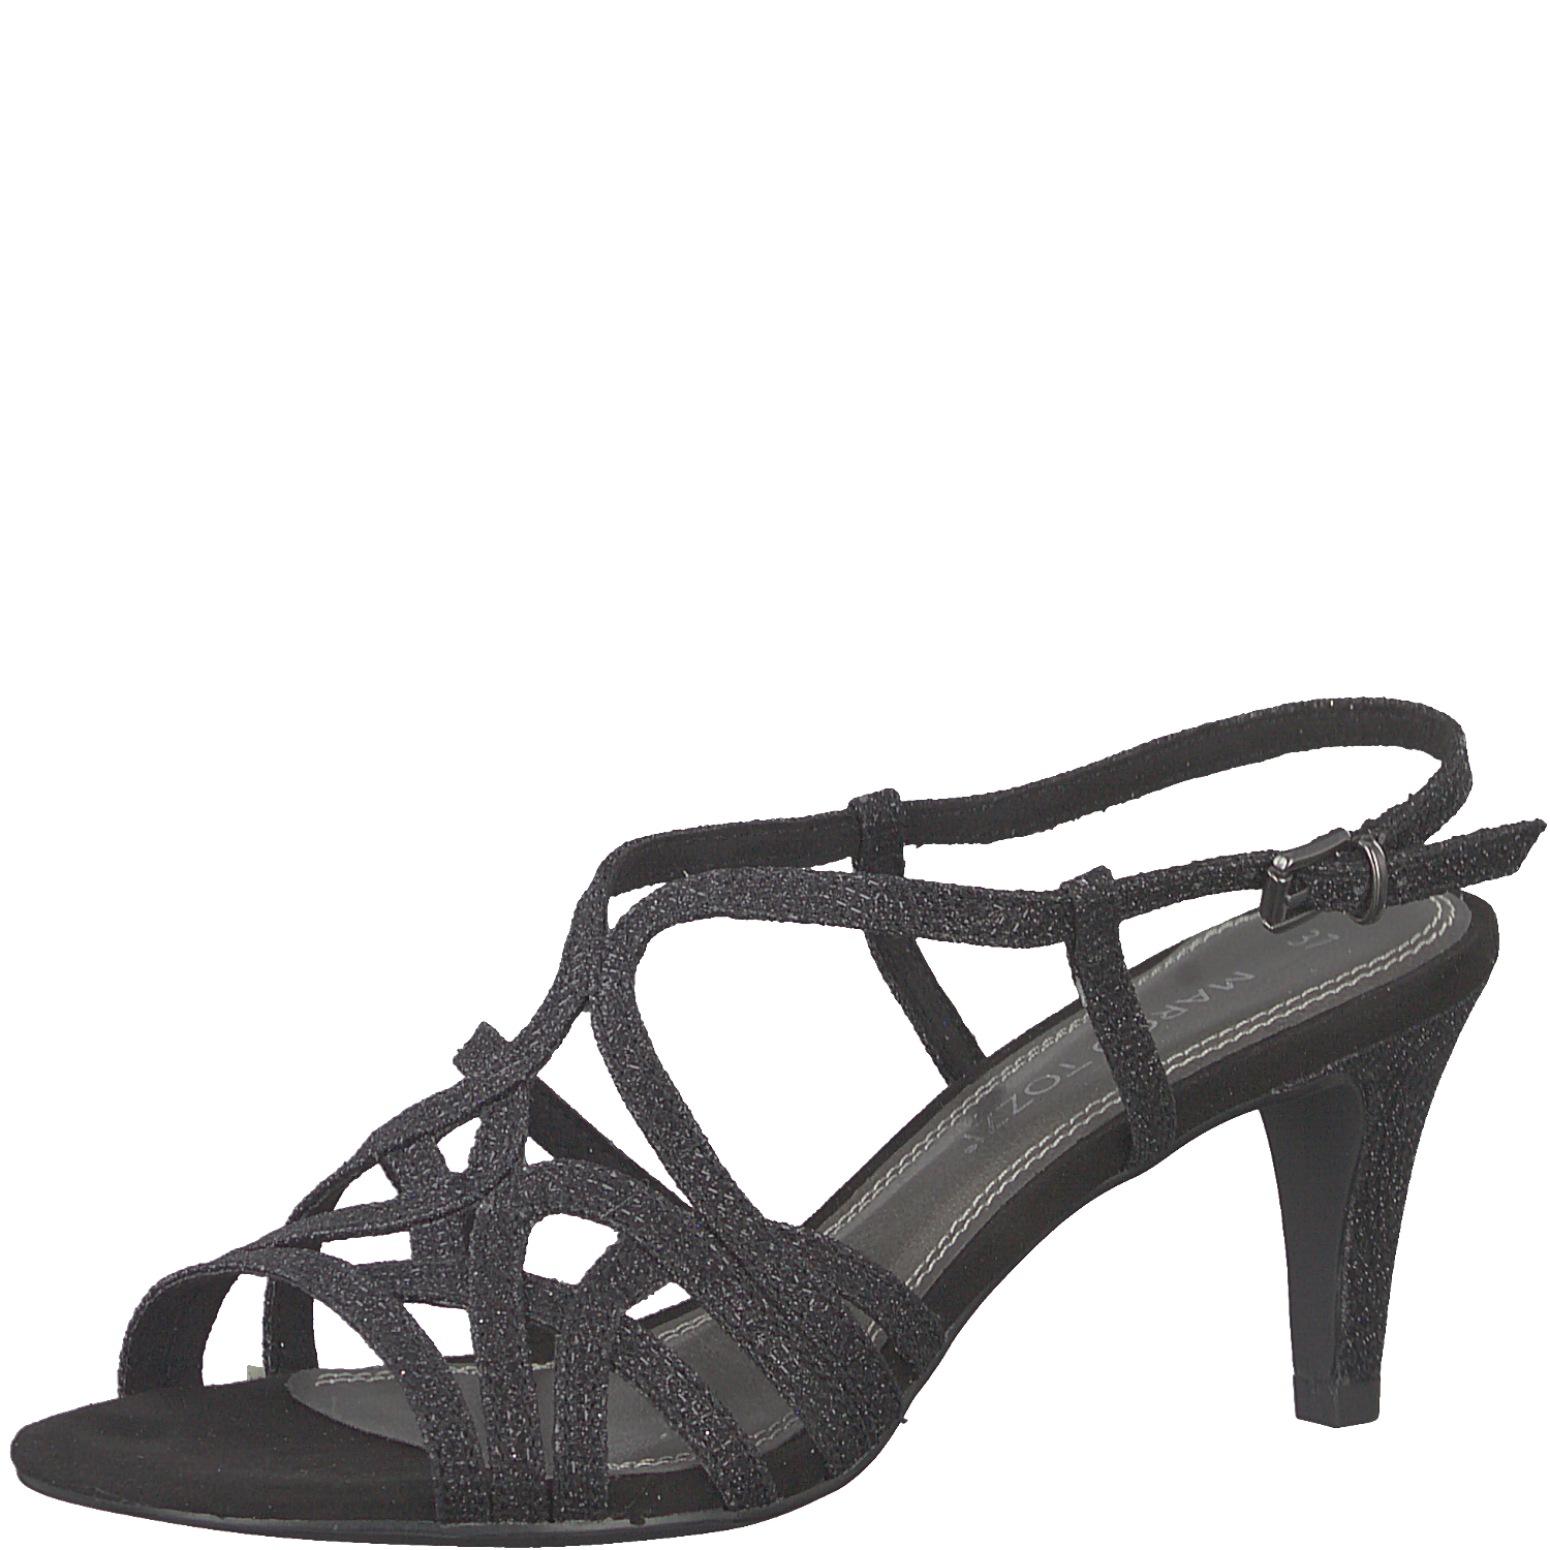 79d163b3bb2a Dámske sandále 2-28328-22 033 MARCO TOZZI BLACK METALLIC – Topánky Olympia  shoes